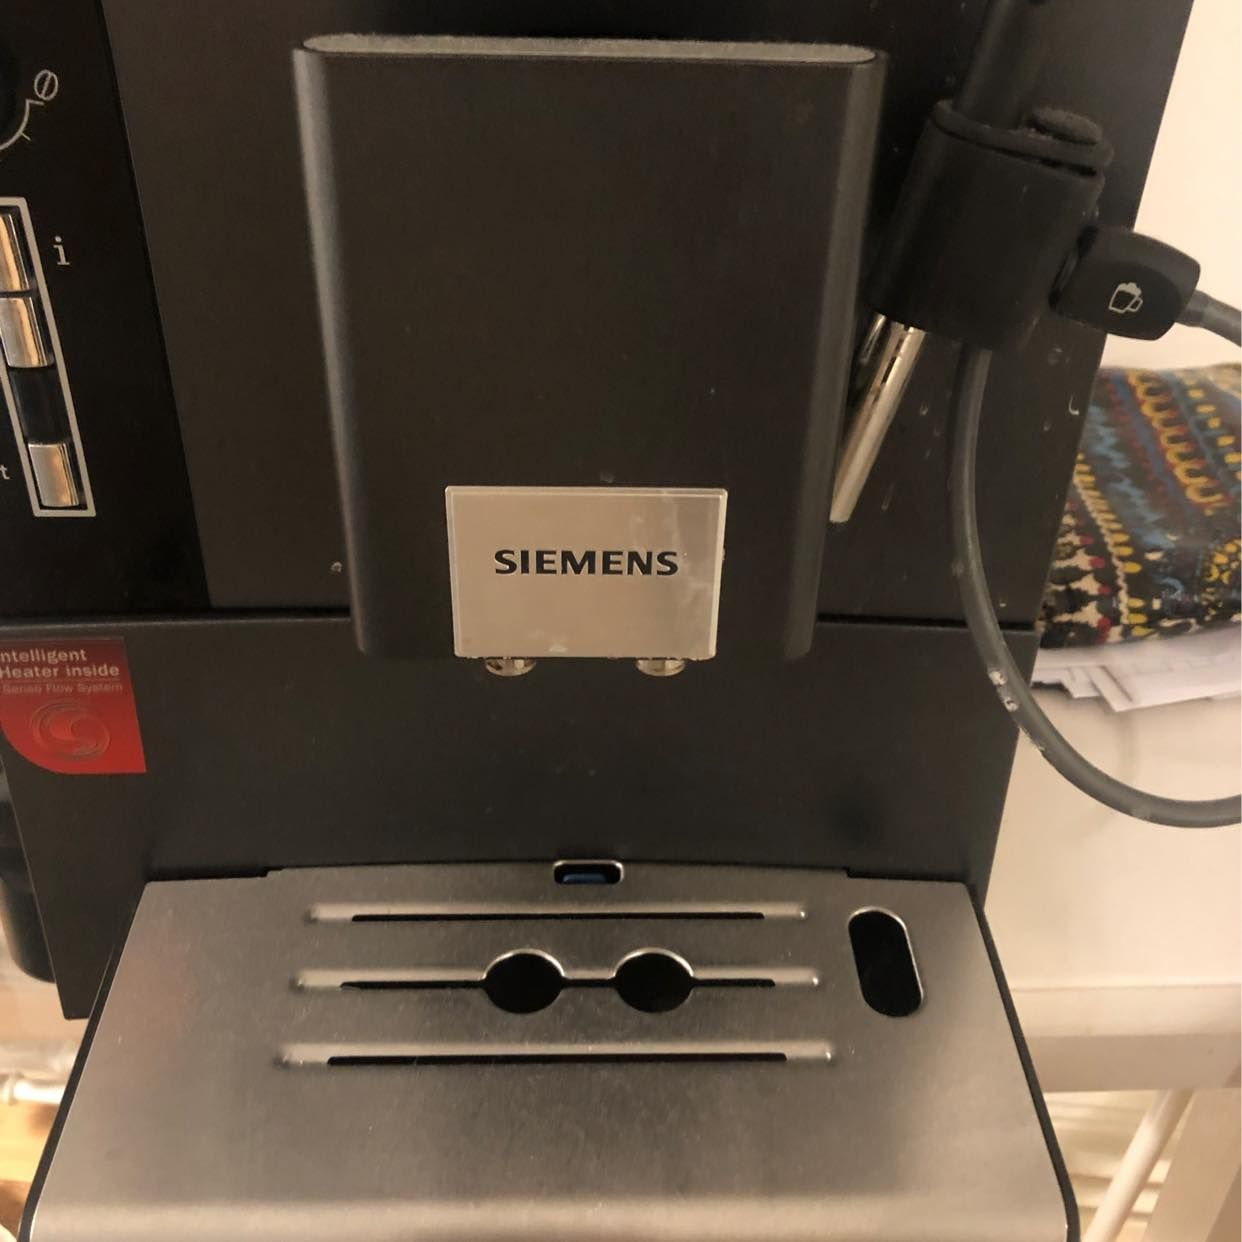 image of Kaffemaskin Siemens - Stockholms Stad